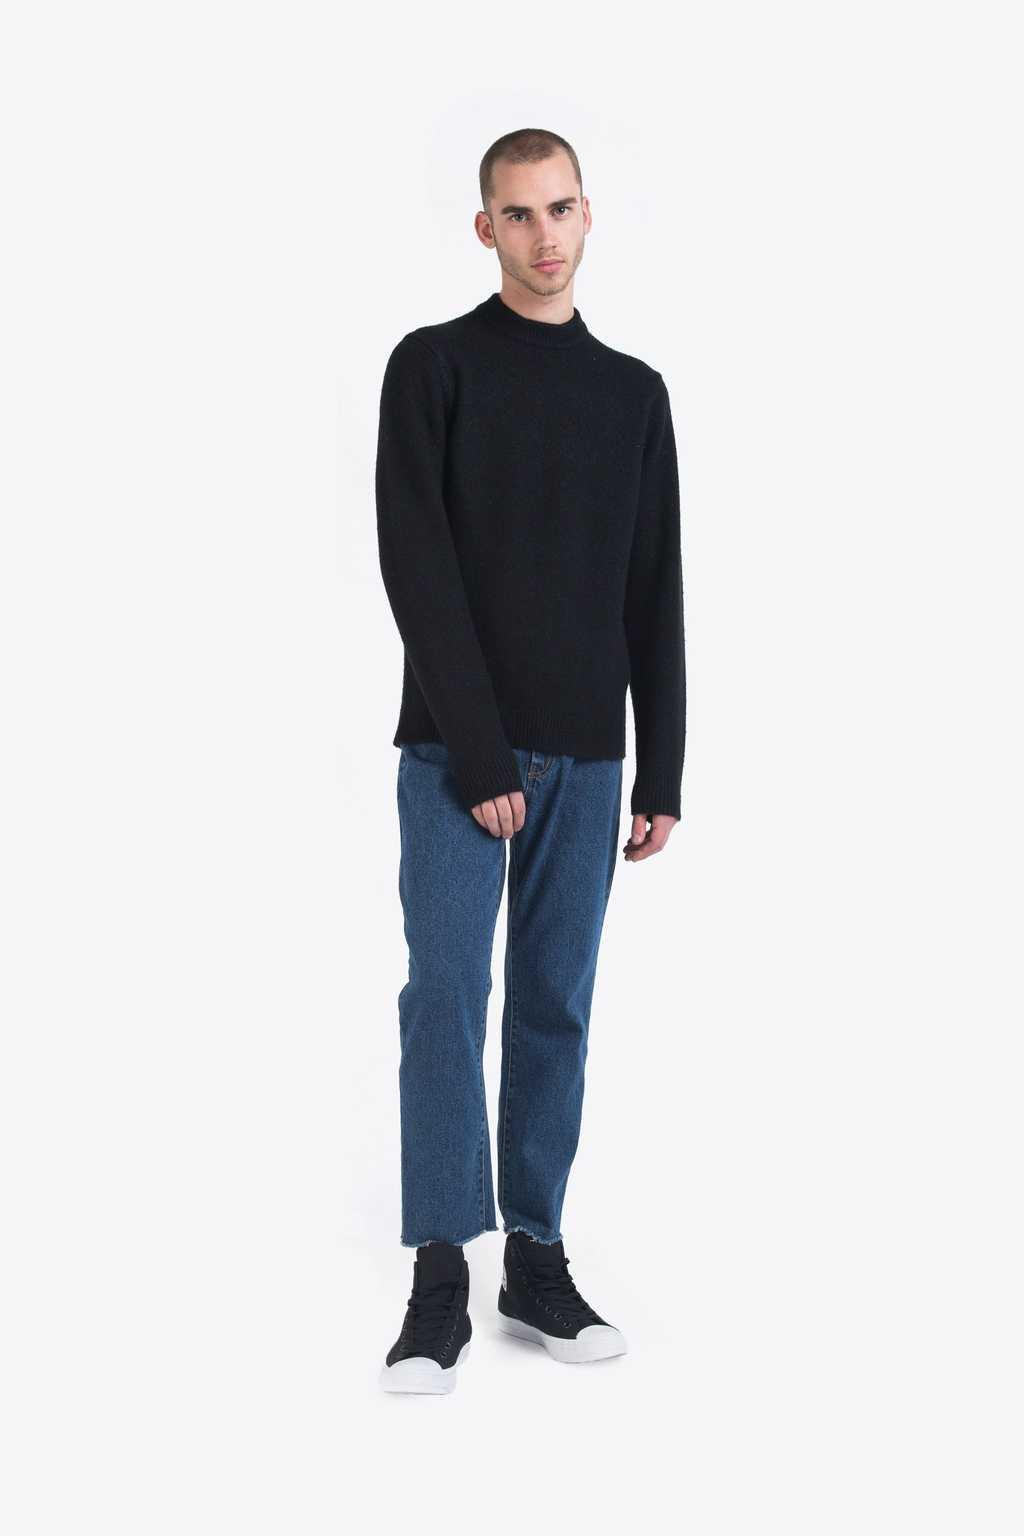 Sweater 7230 Black 5